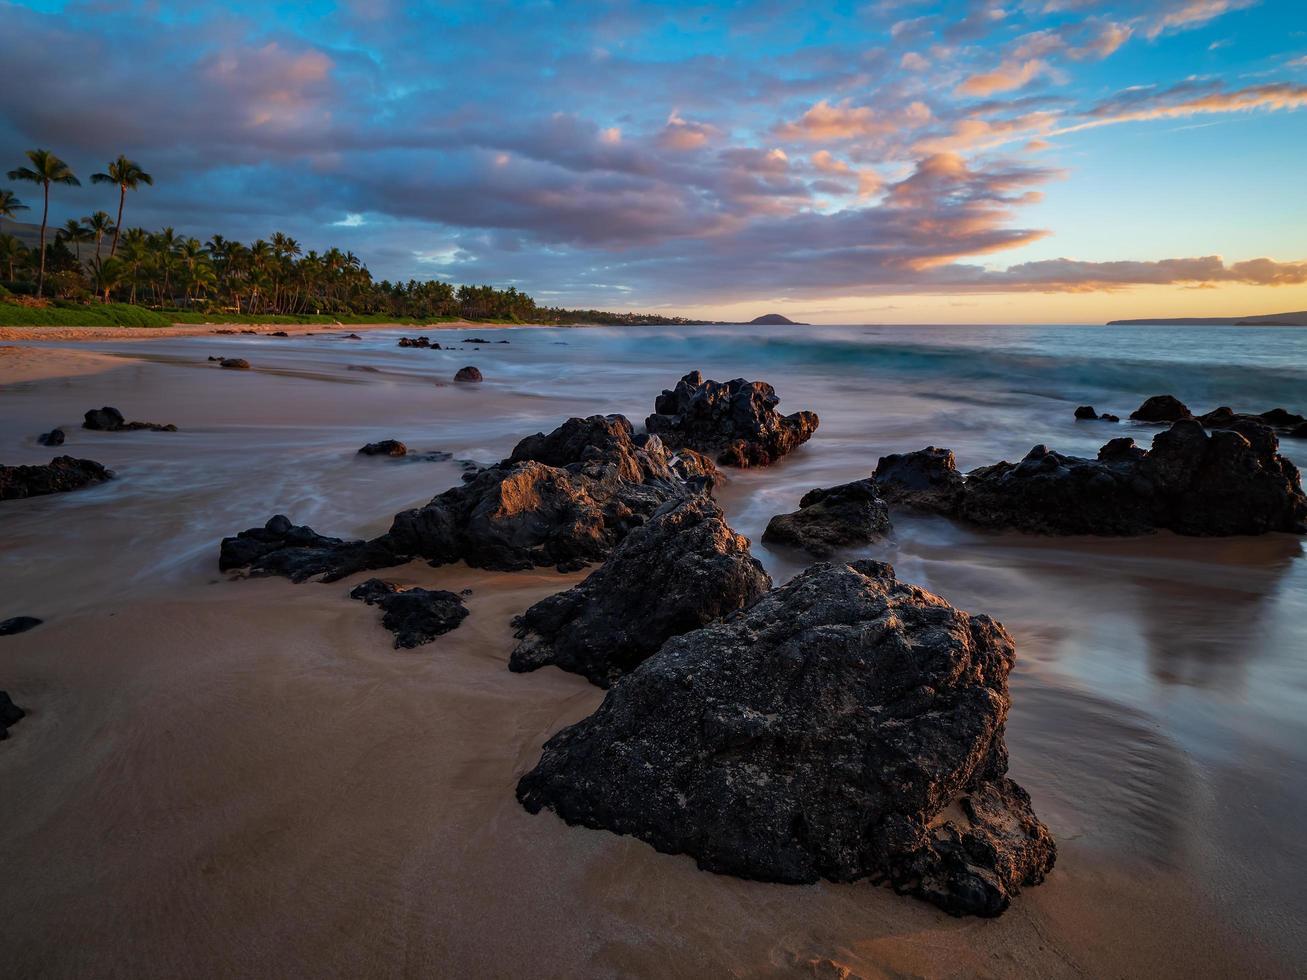 bruna klippor på stranden foto